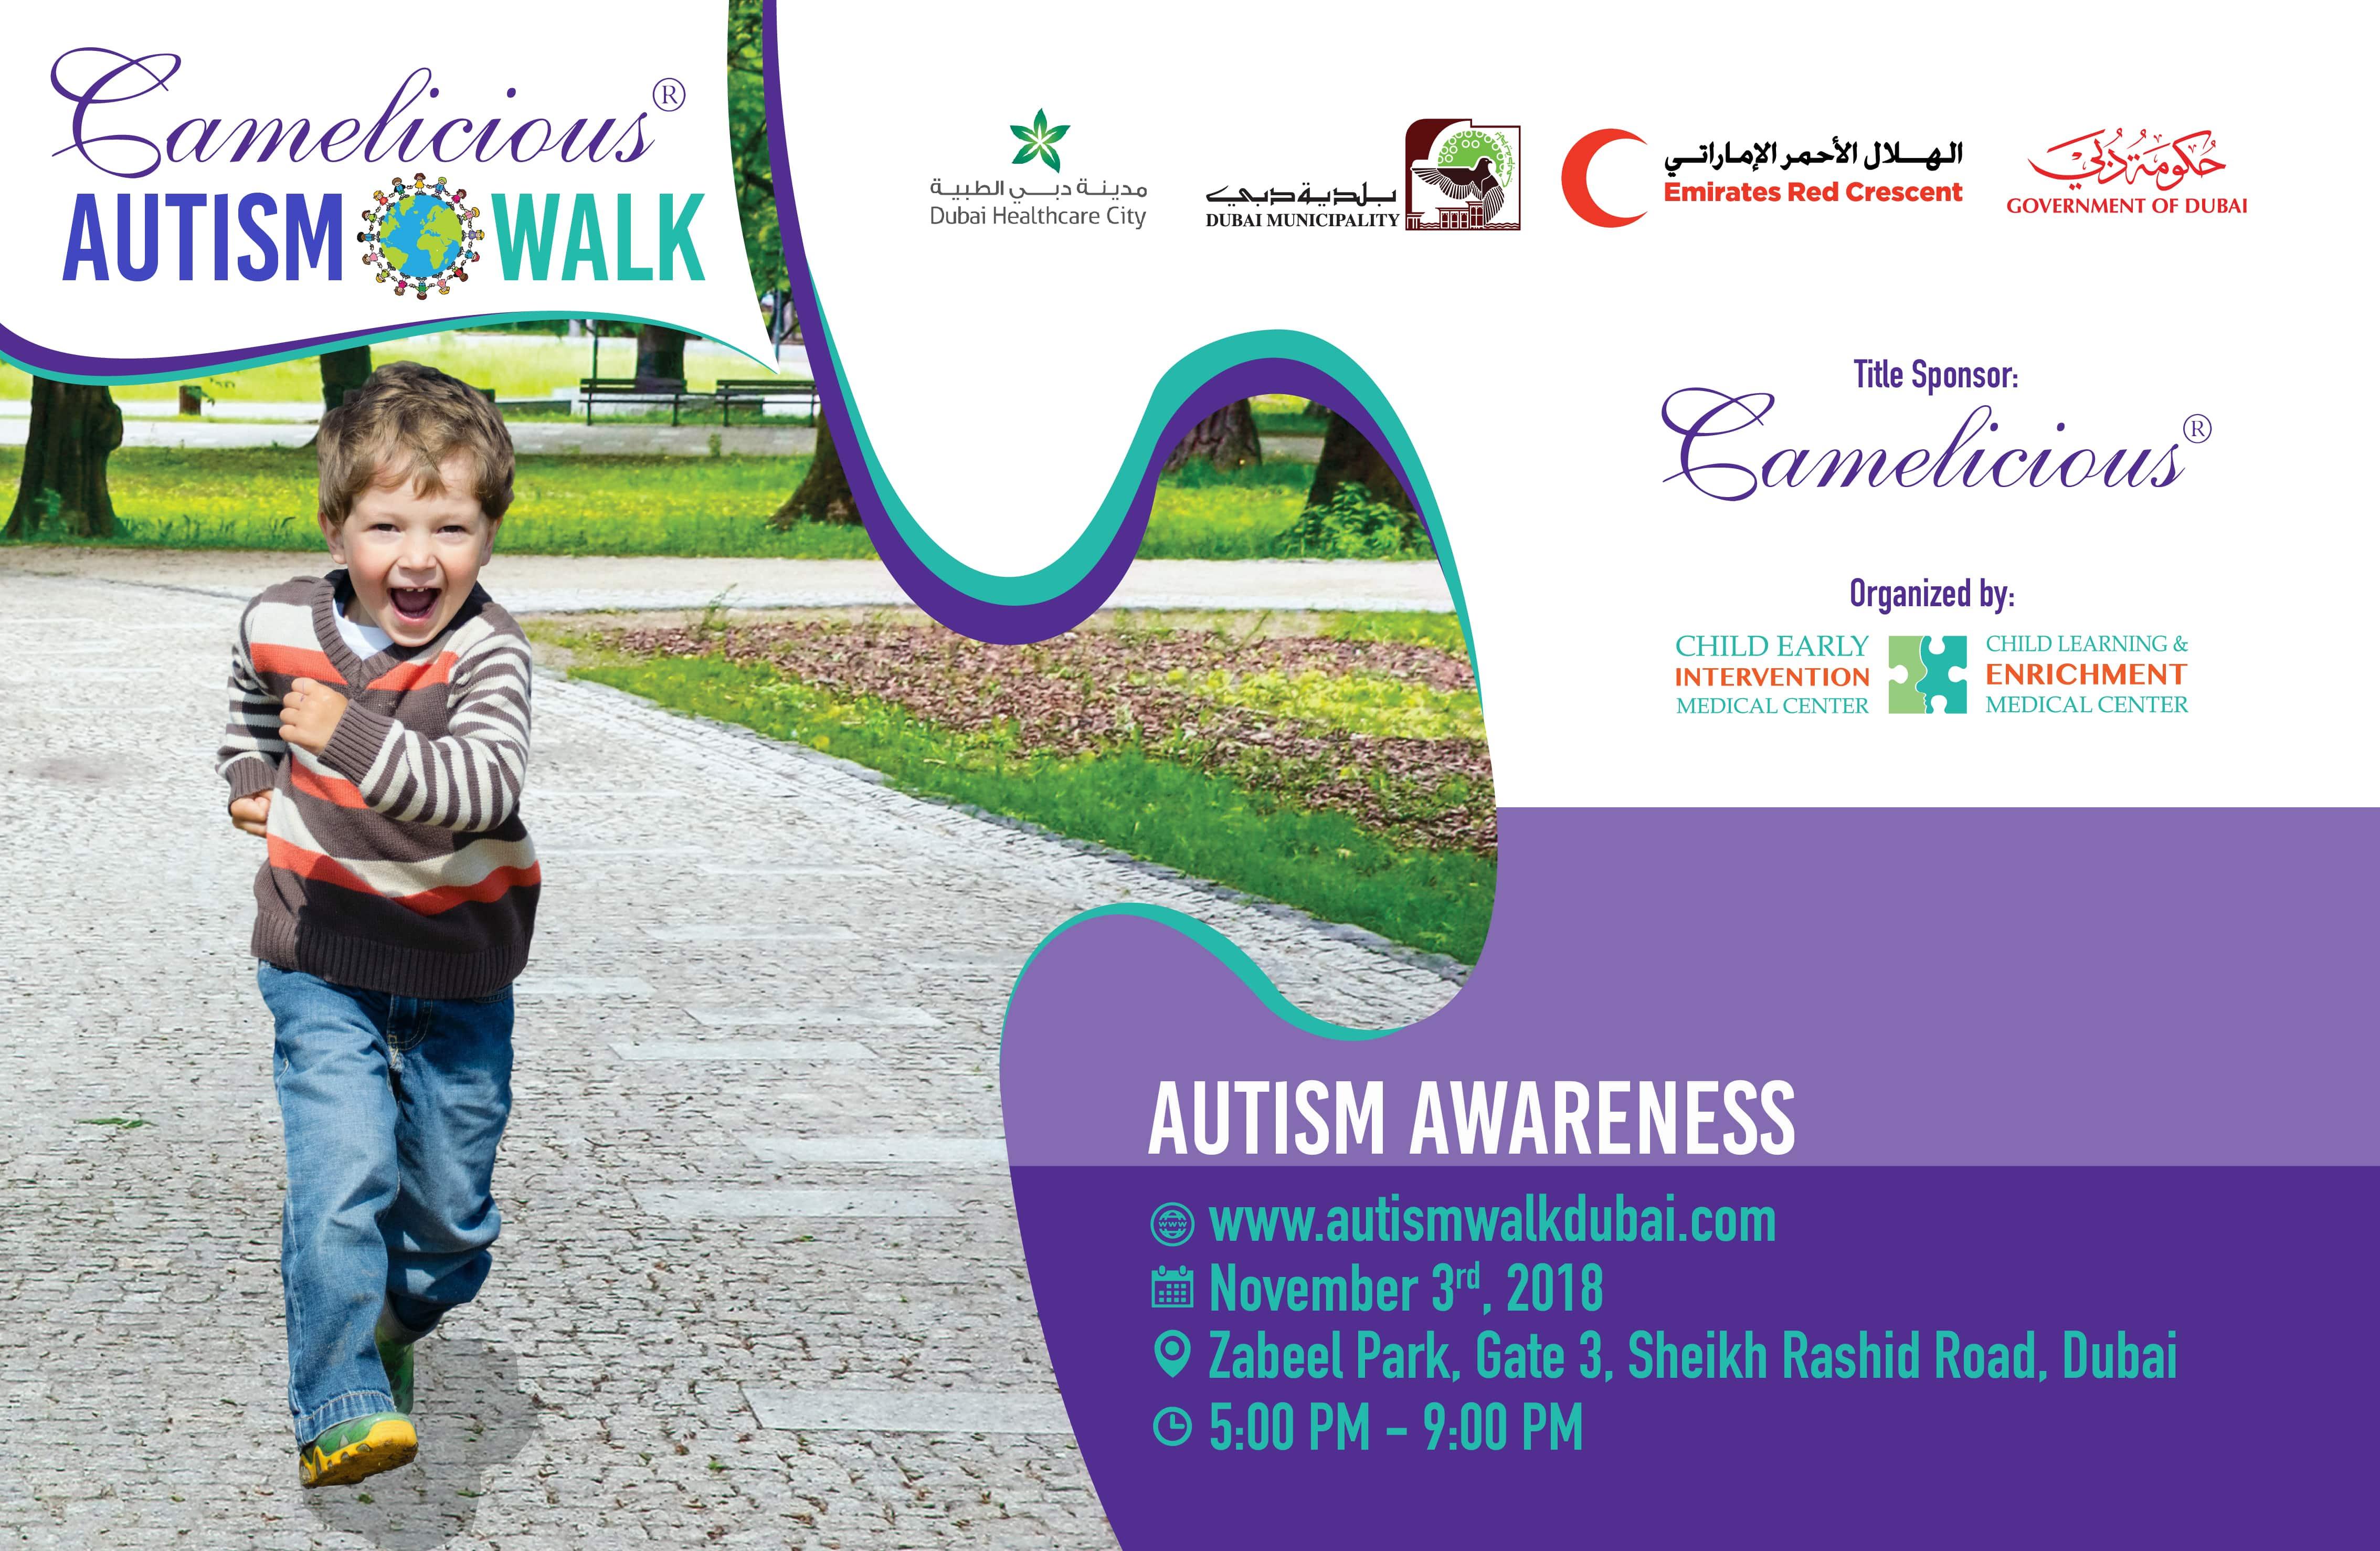 Camelicious Autism Walk 2018 @ Zabeel Park- Gate 1, Dubai